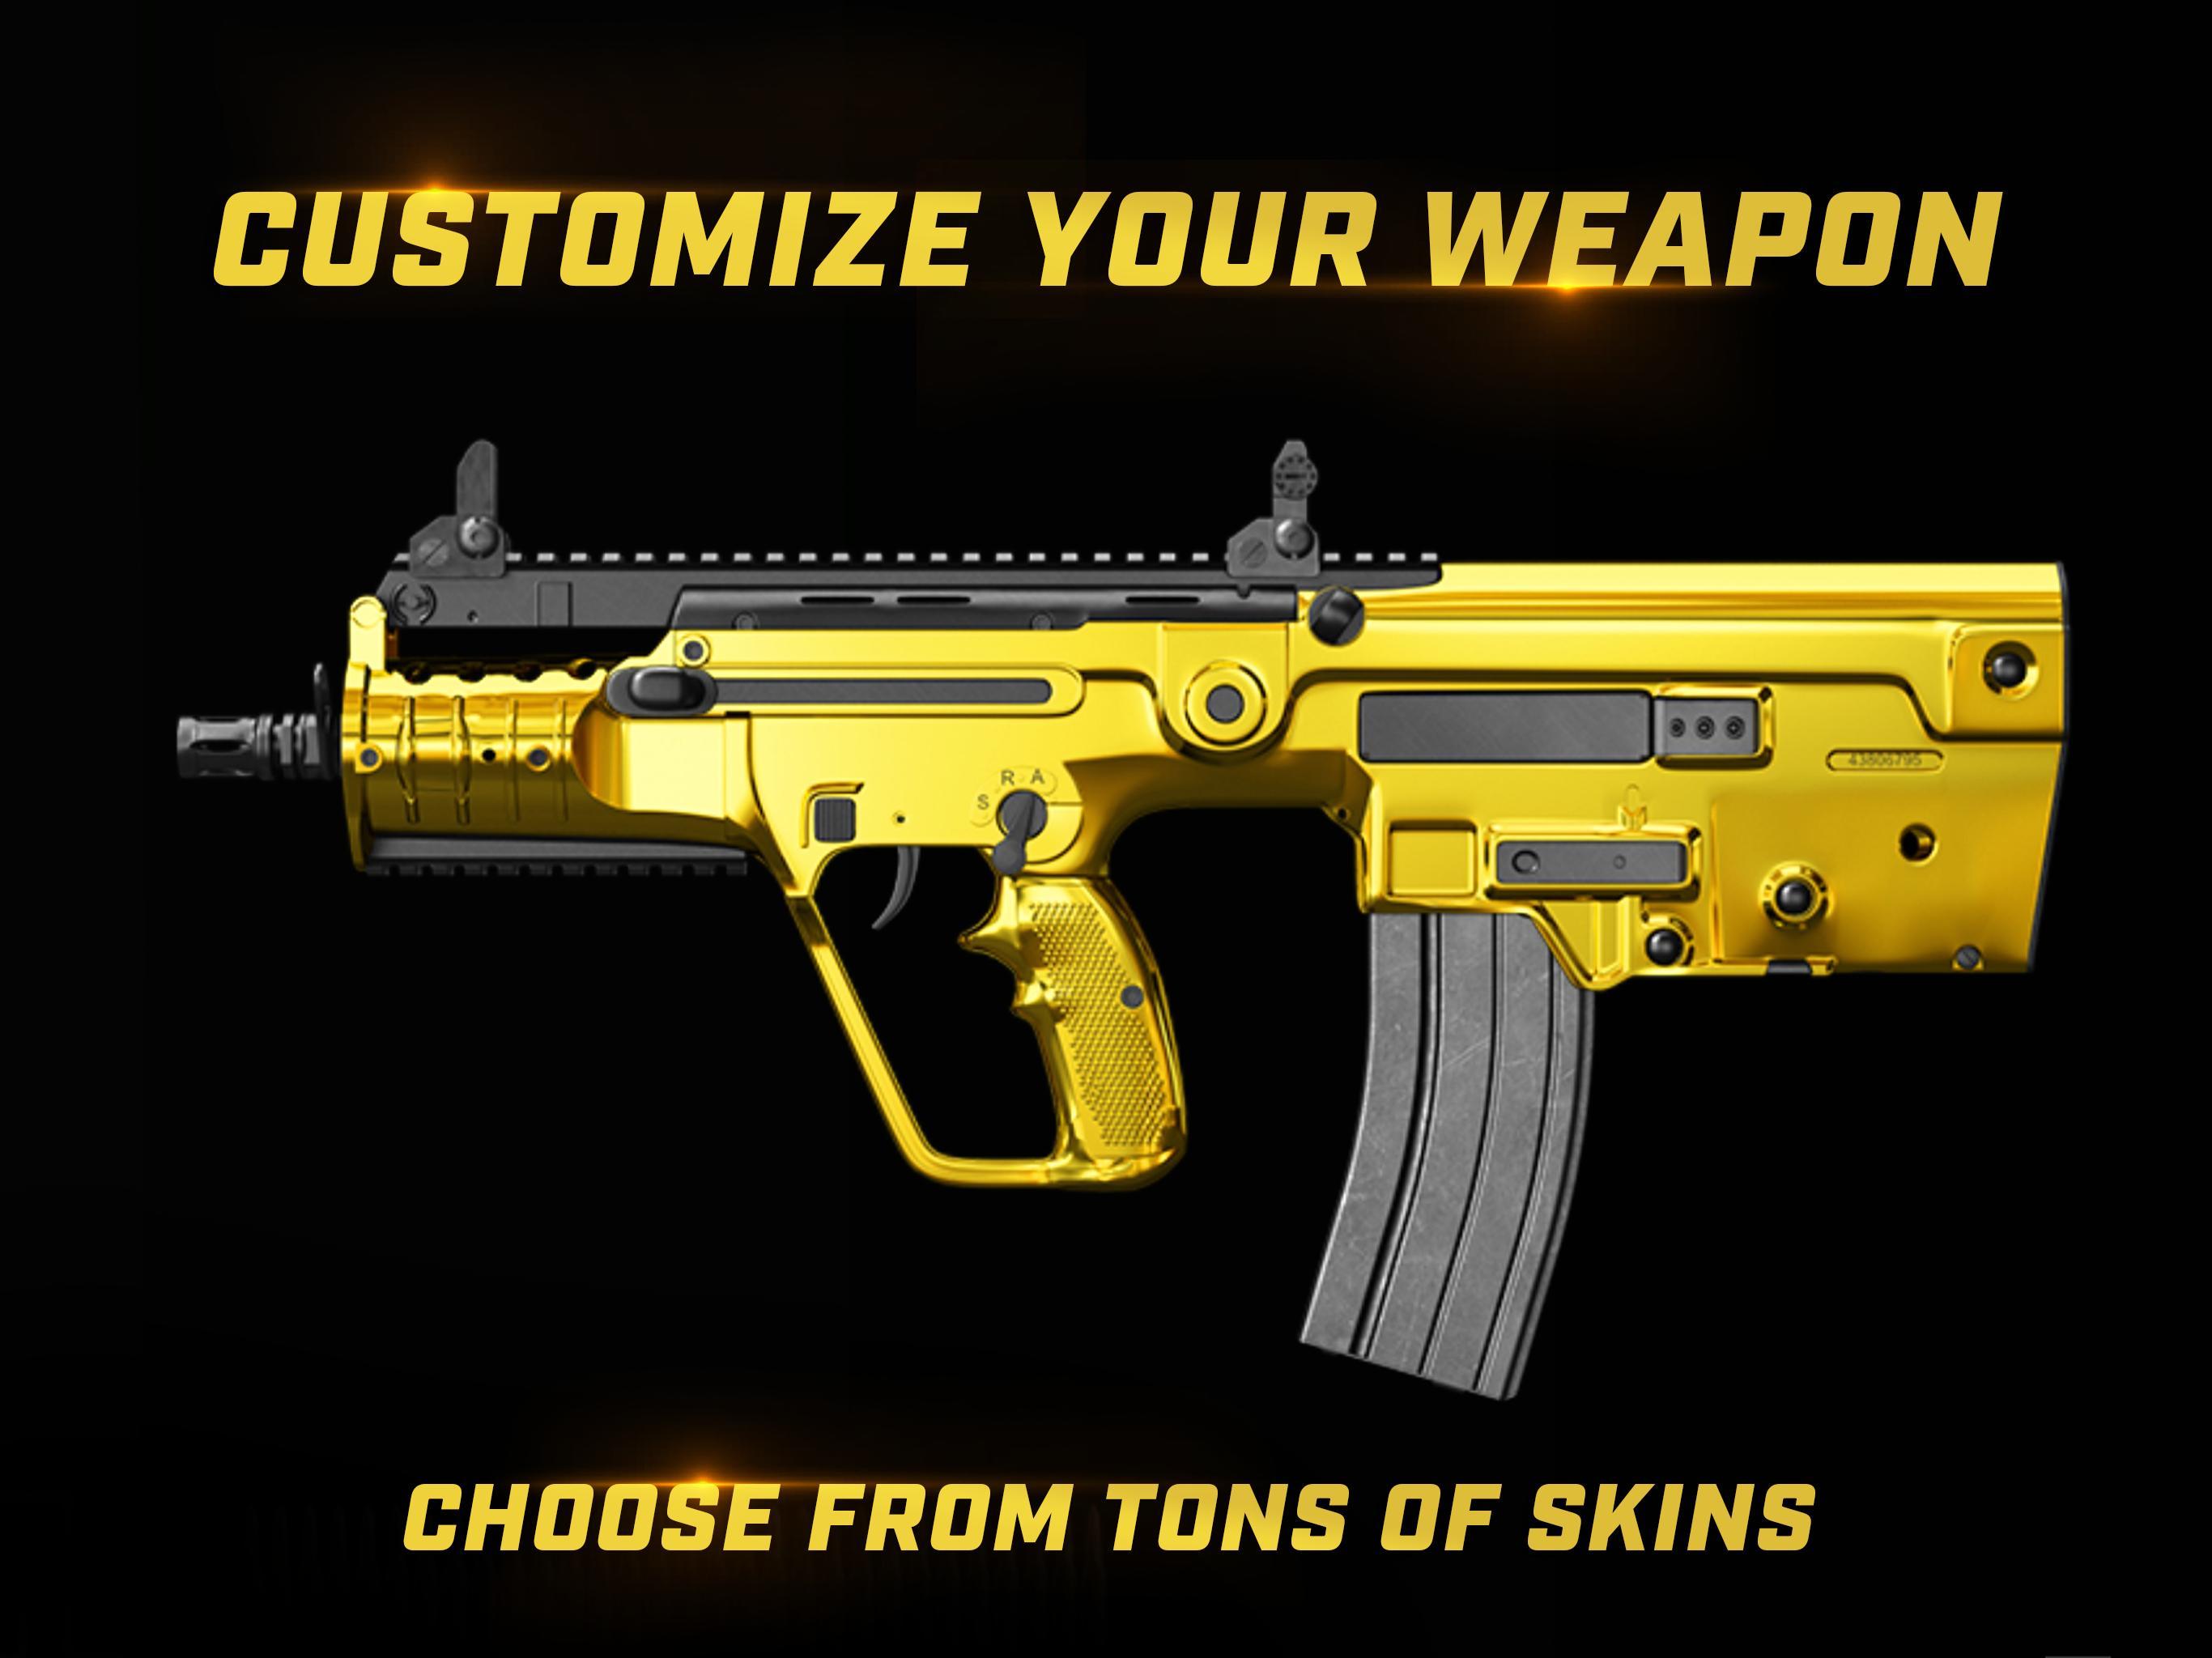 iGun Pro The Original Gun App 5.26 Screenshot 9